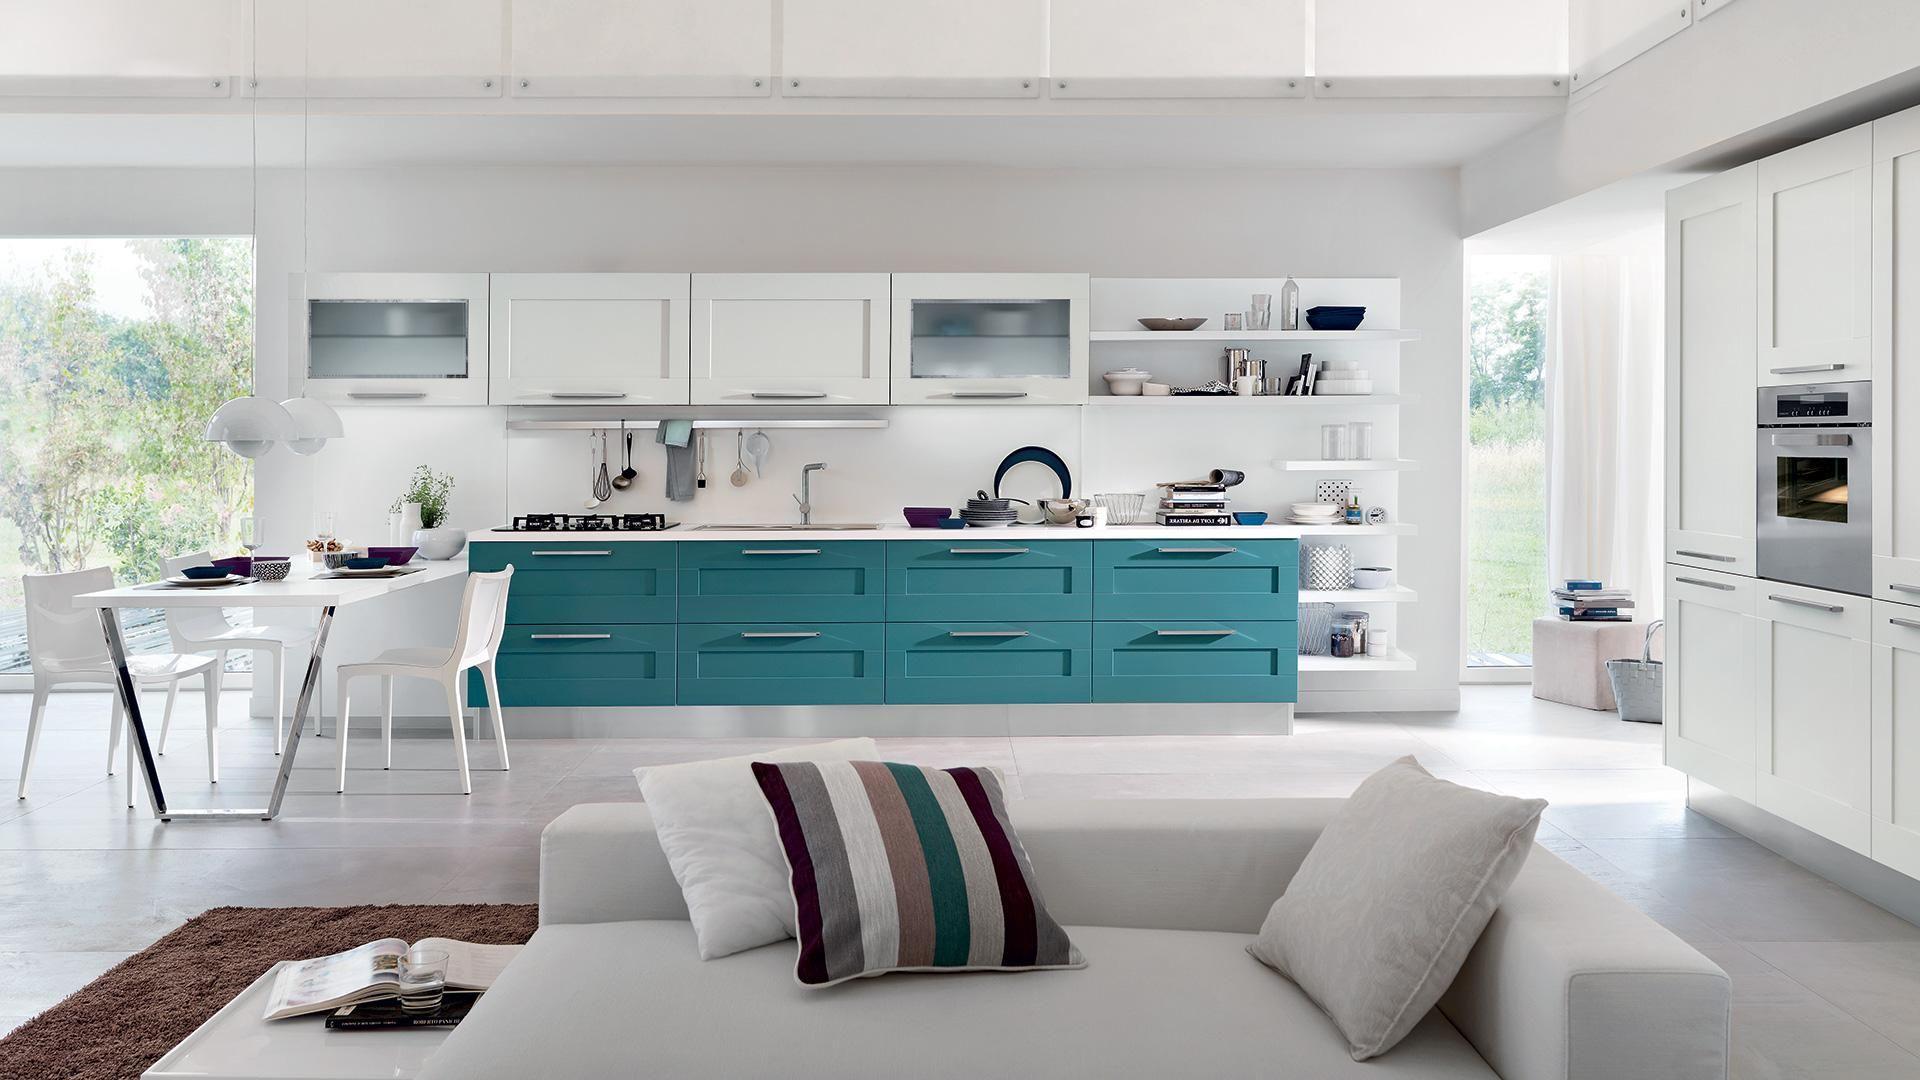 Cocina blanca y verde agua. | Casas color verde, Cocinas modernas, Diseño  de cocina moderna